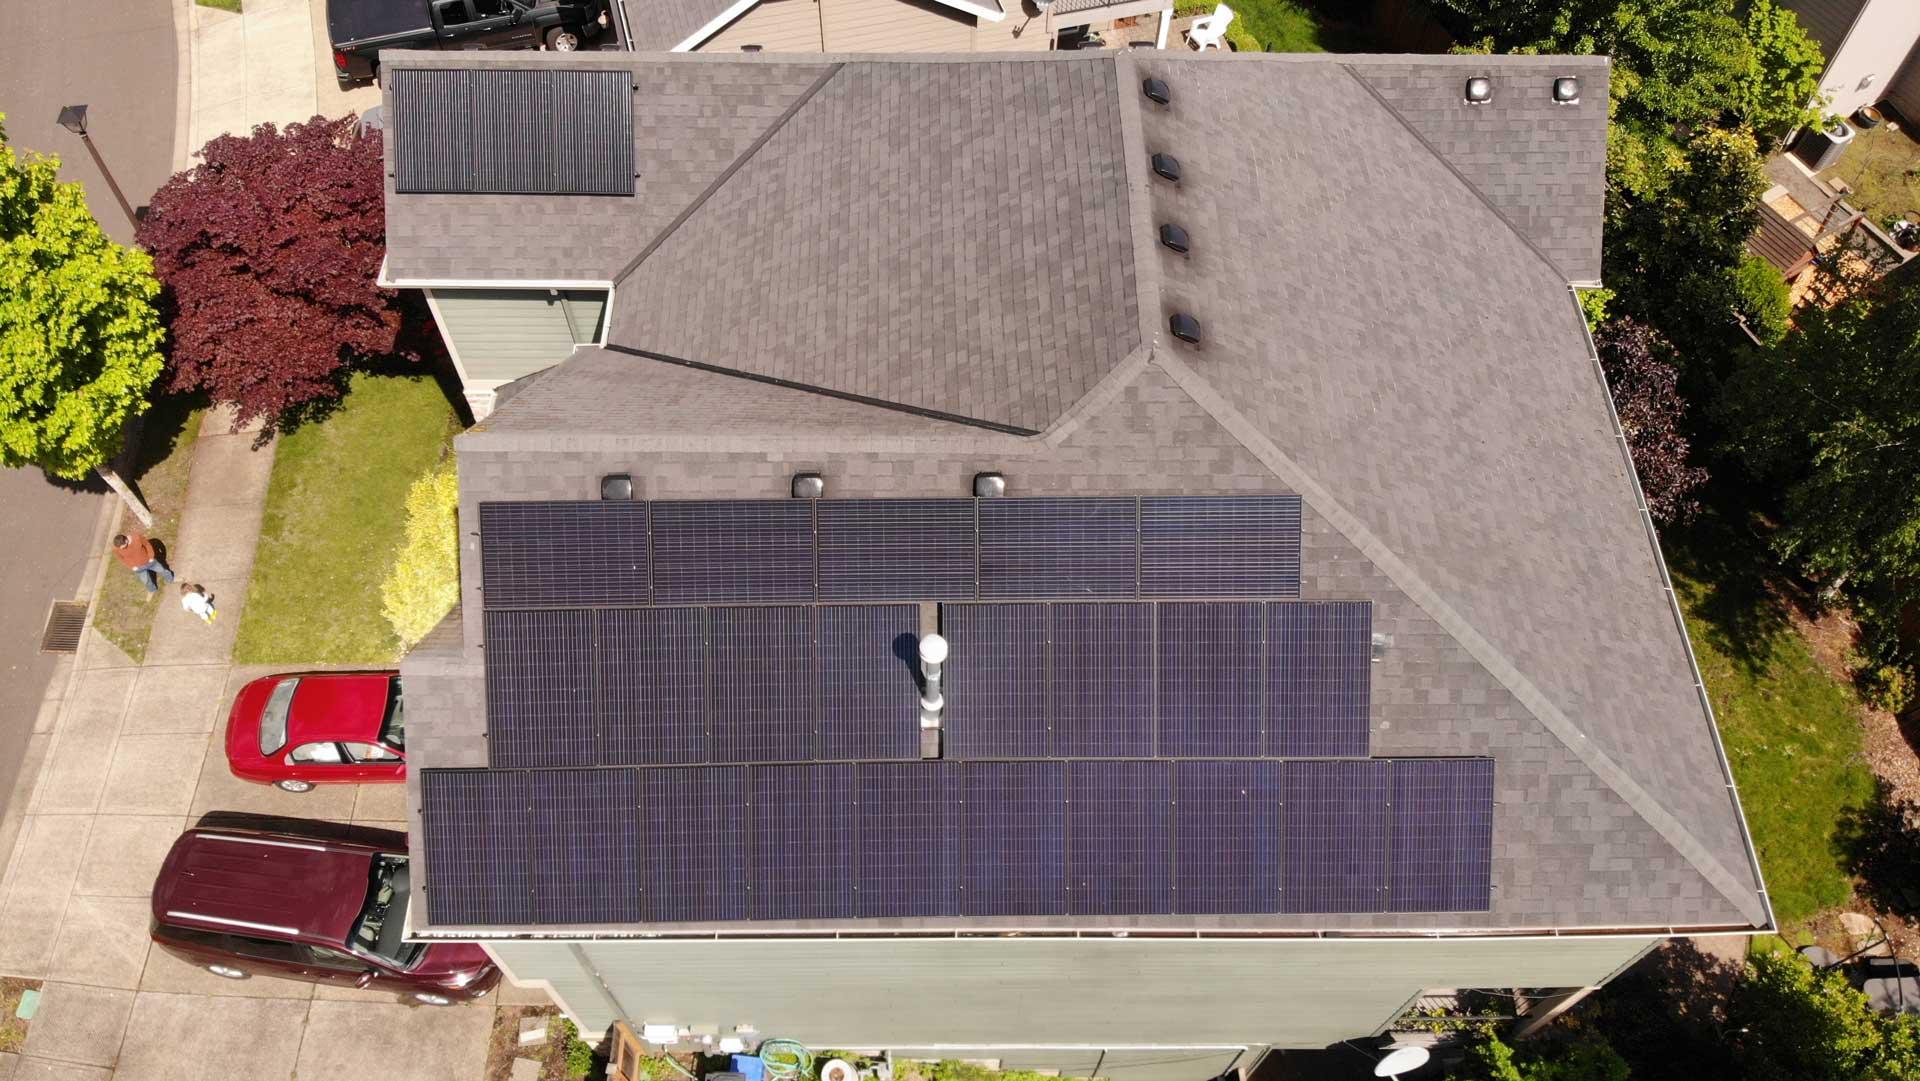 local solar installation company